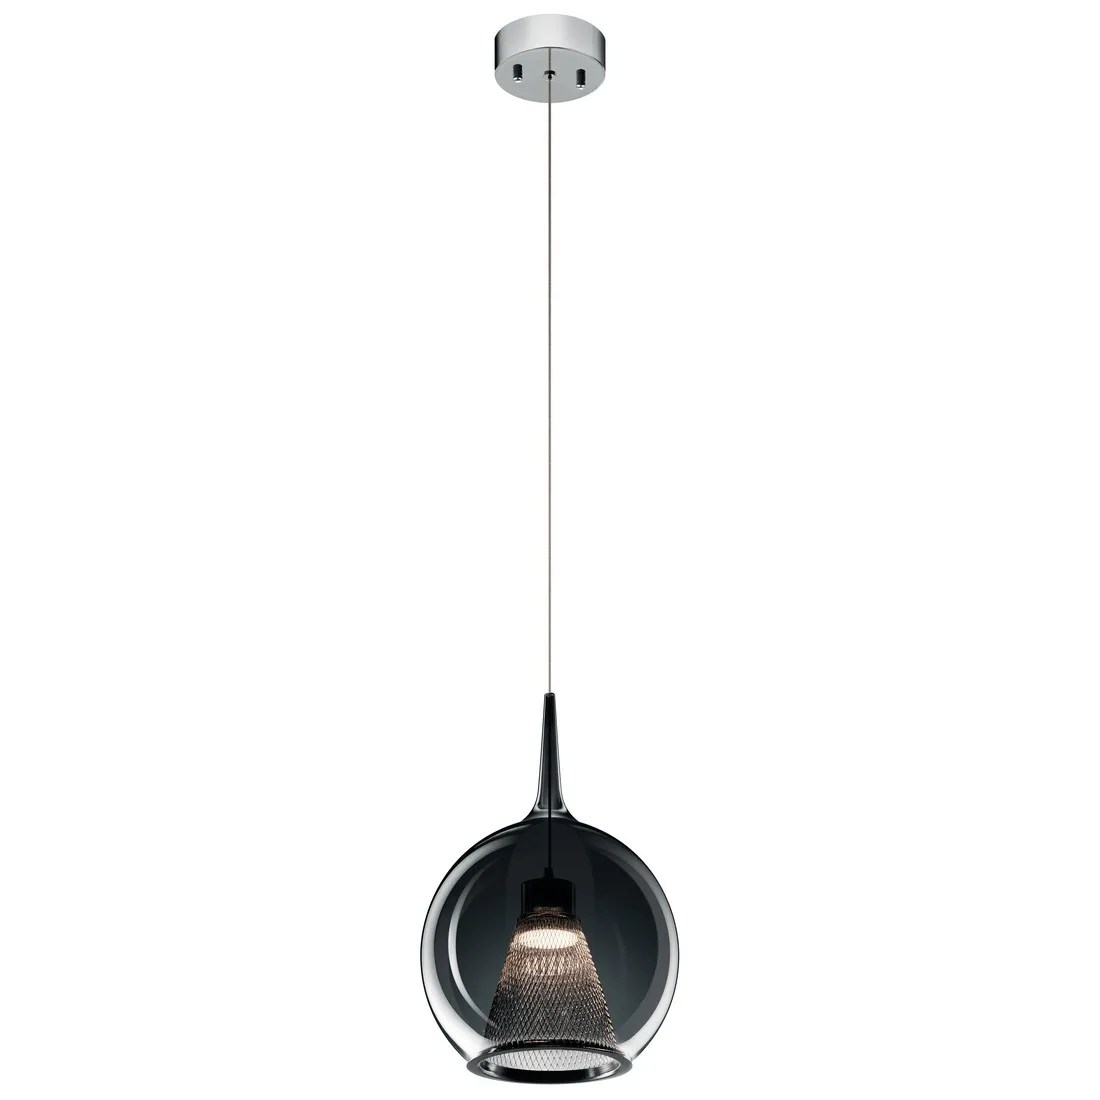 elan zin 9 75 led smoke glass mini pendant in chrome